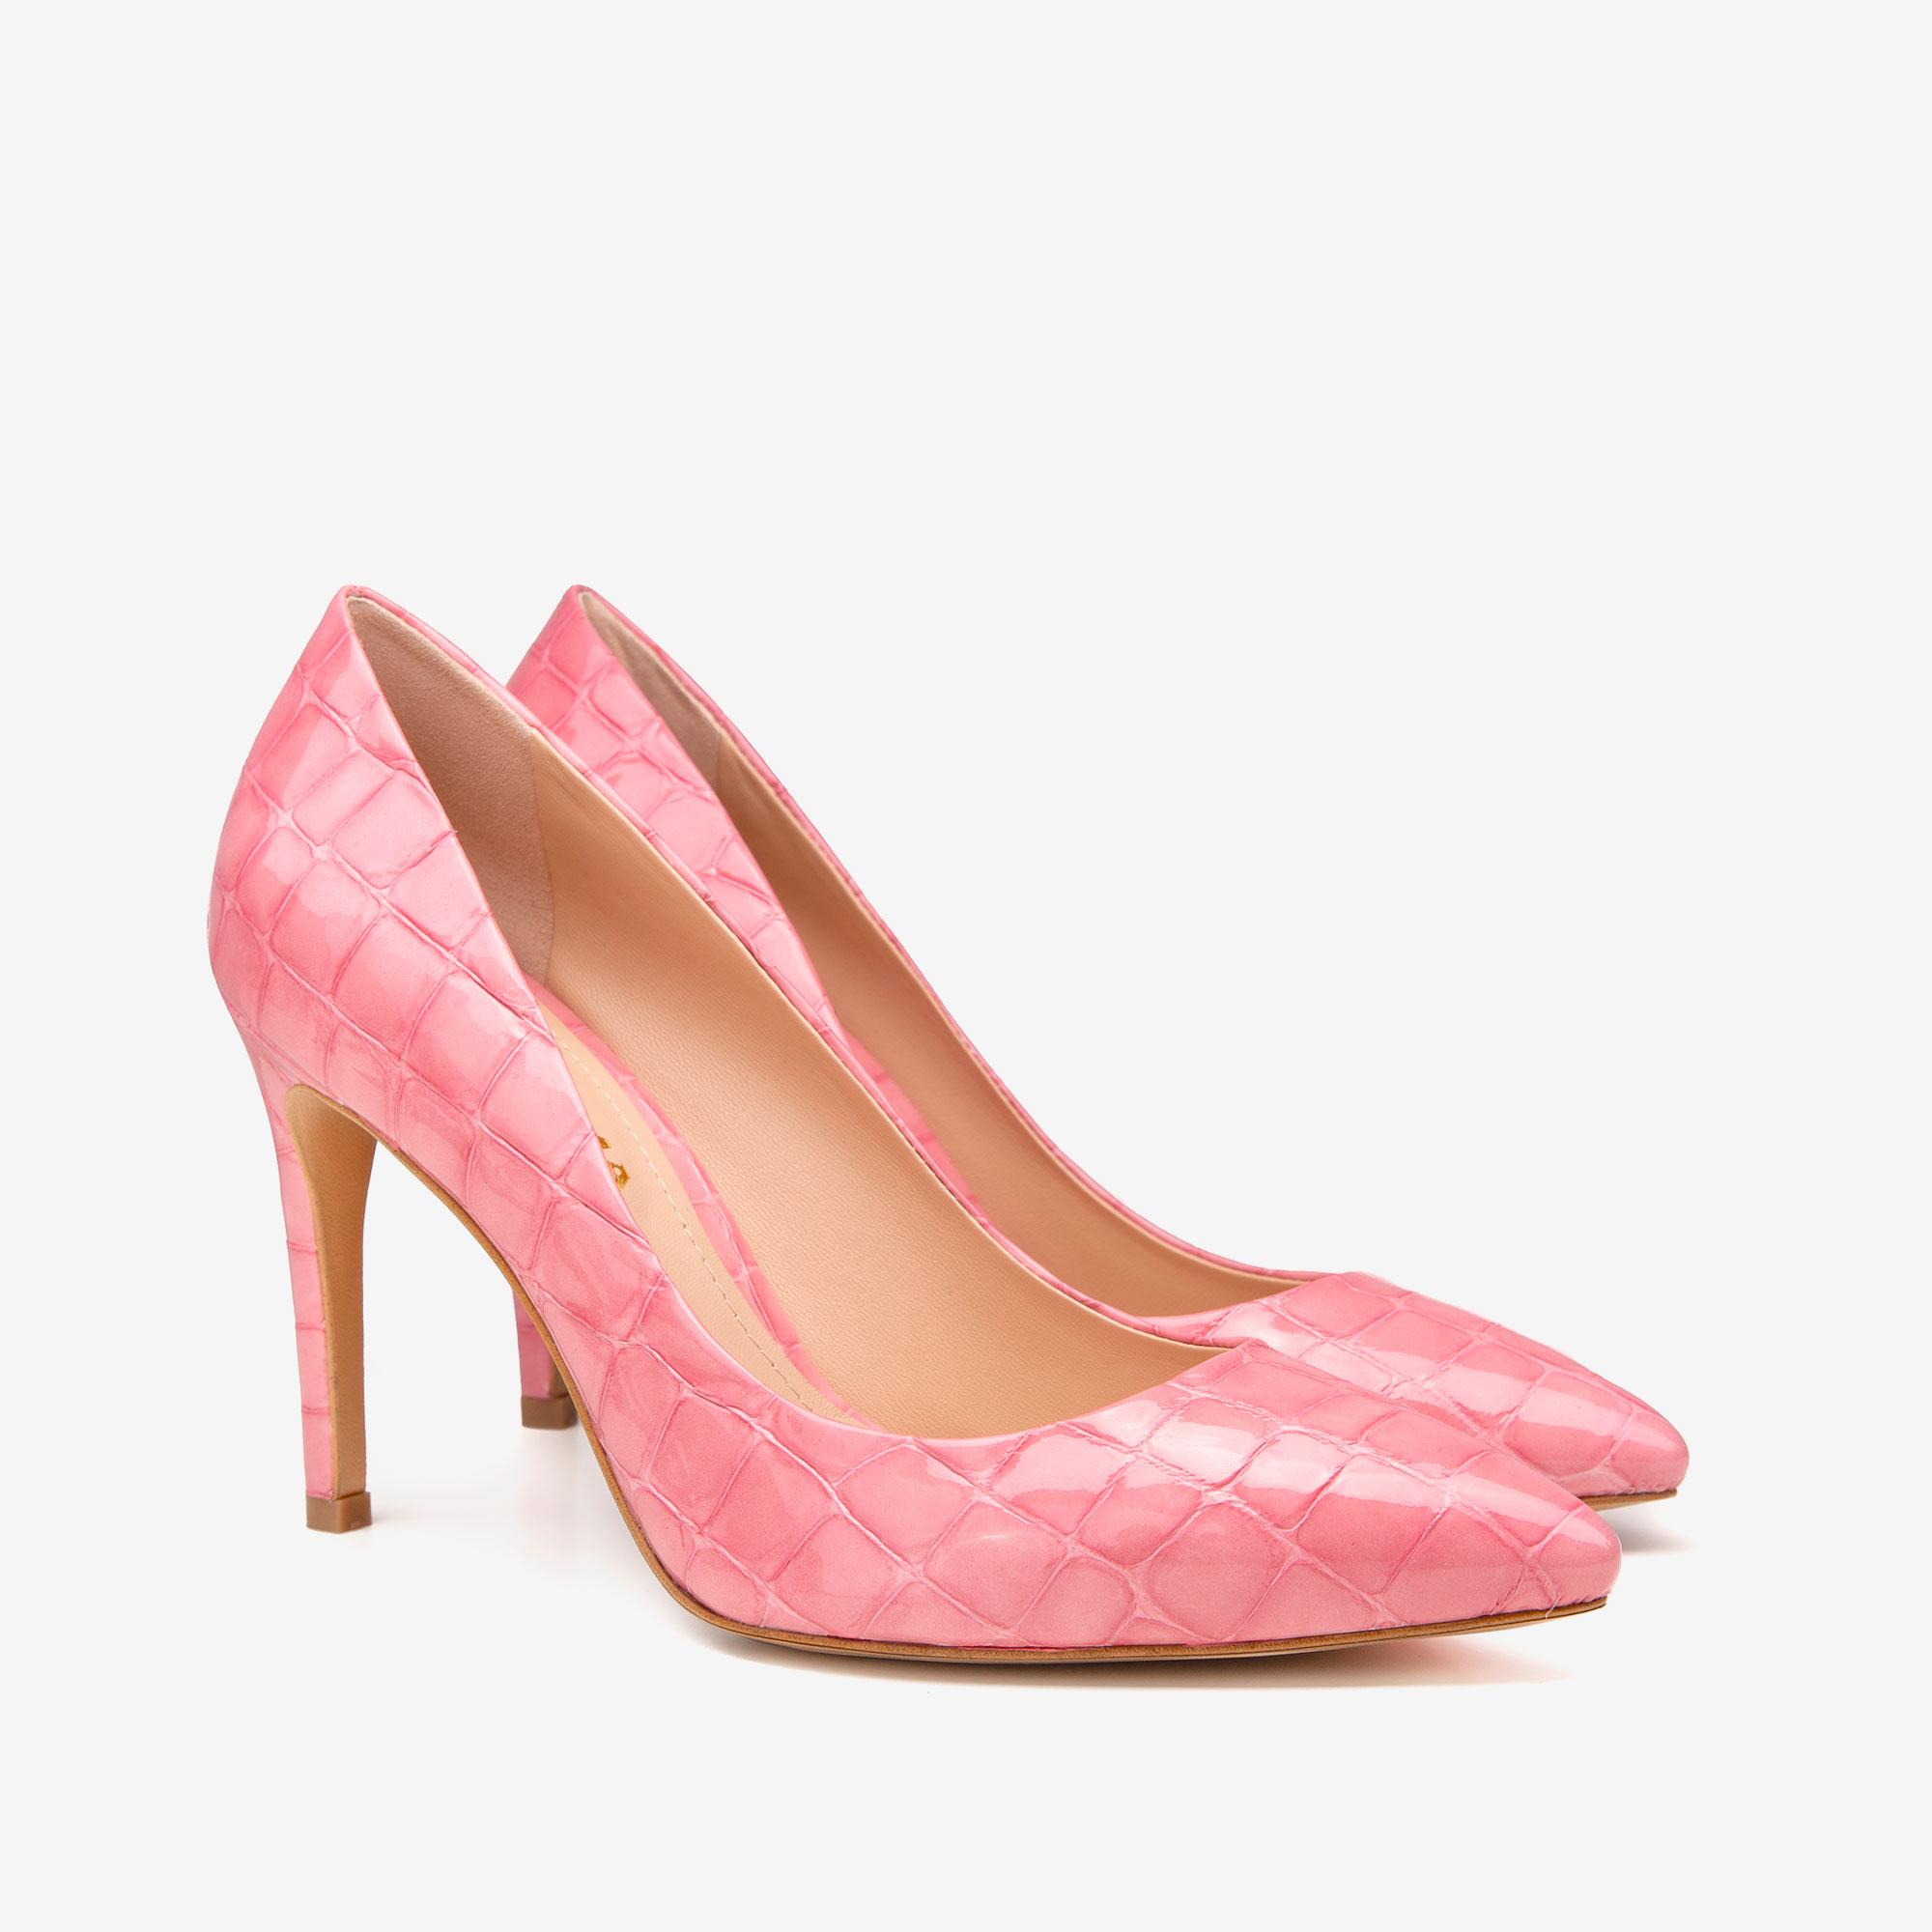 Pantofi cu varf ascutit din piele croco roz Ginissima imagine 1